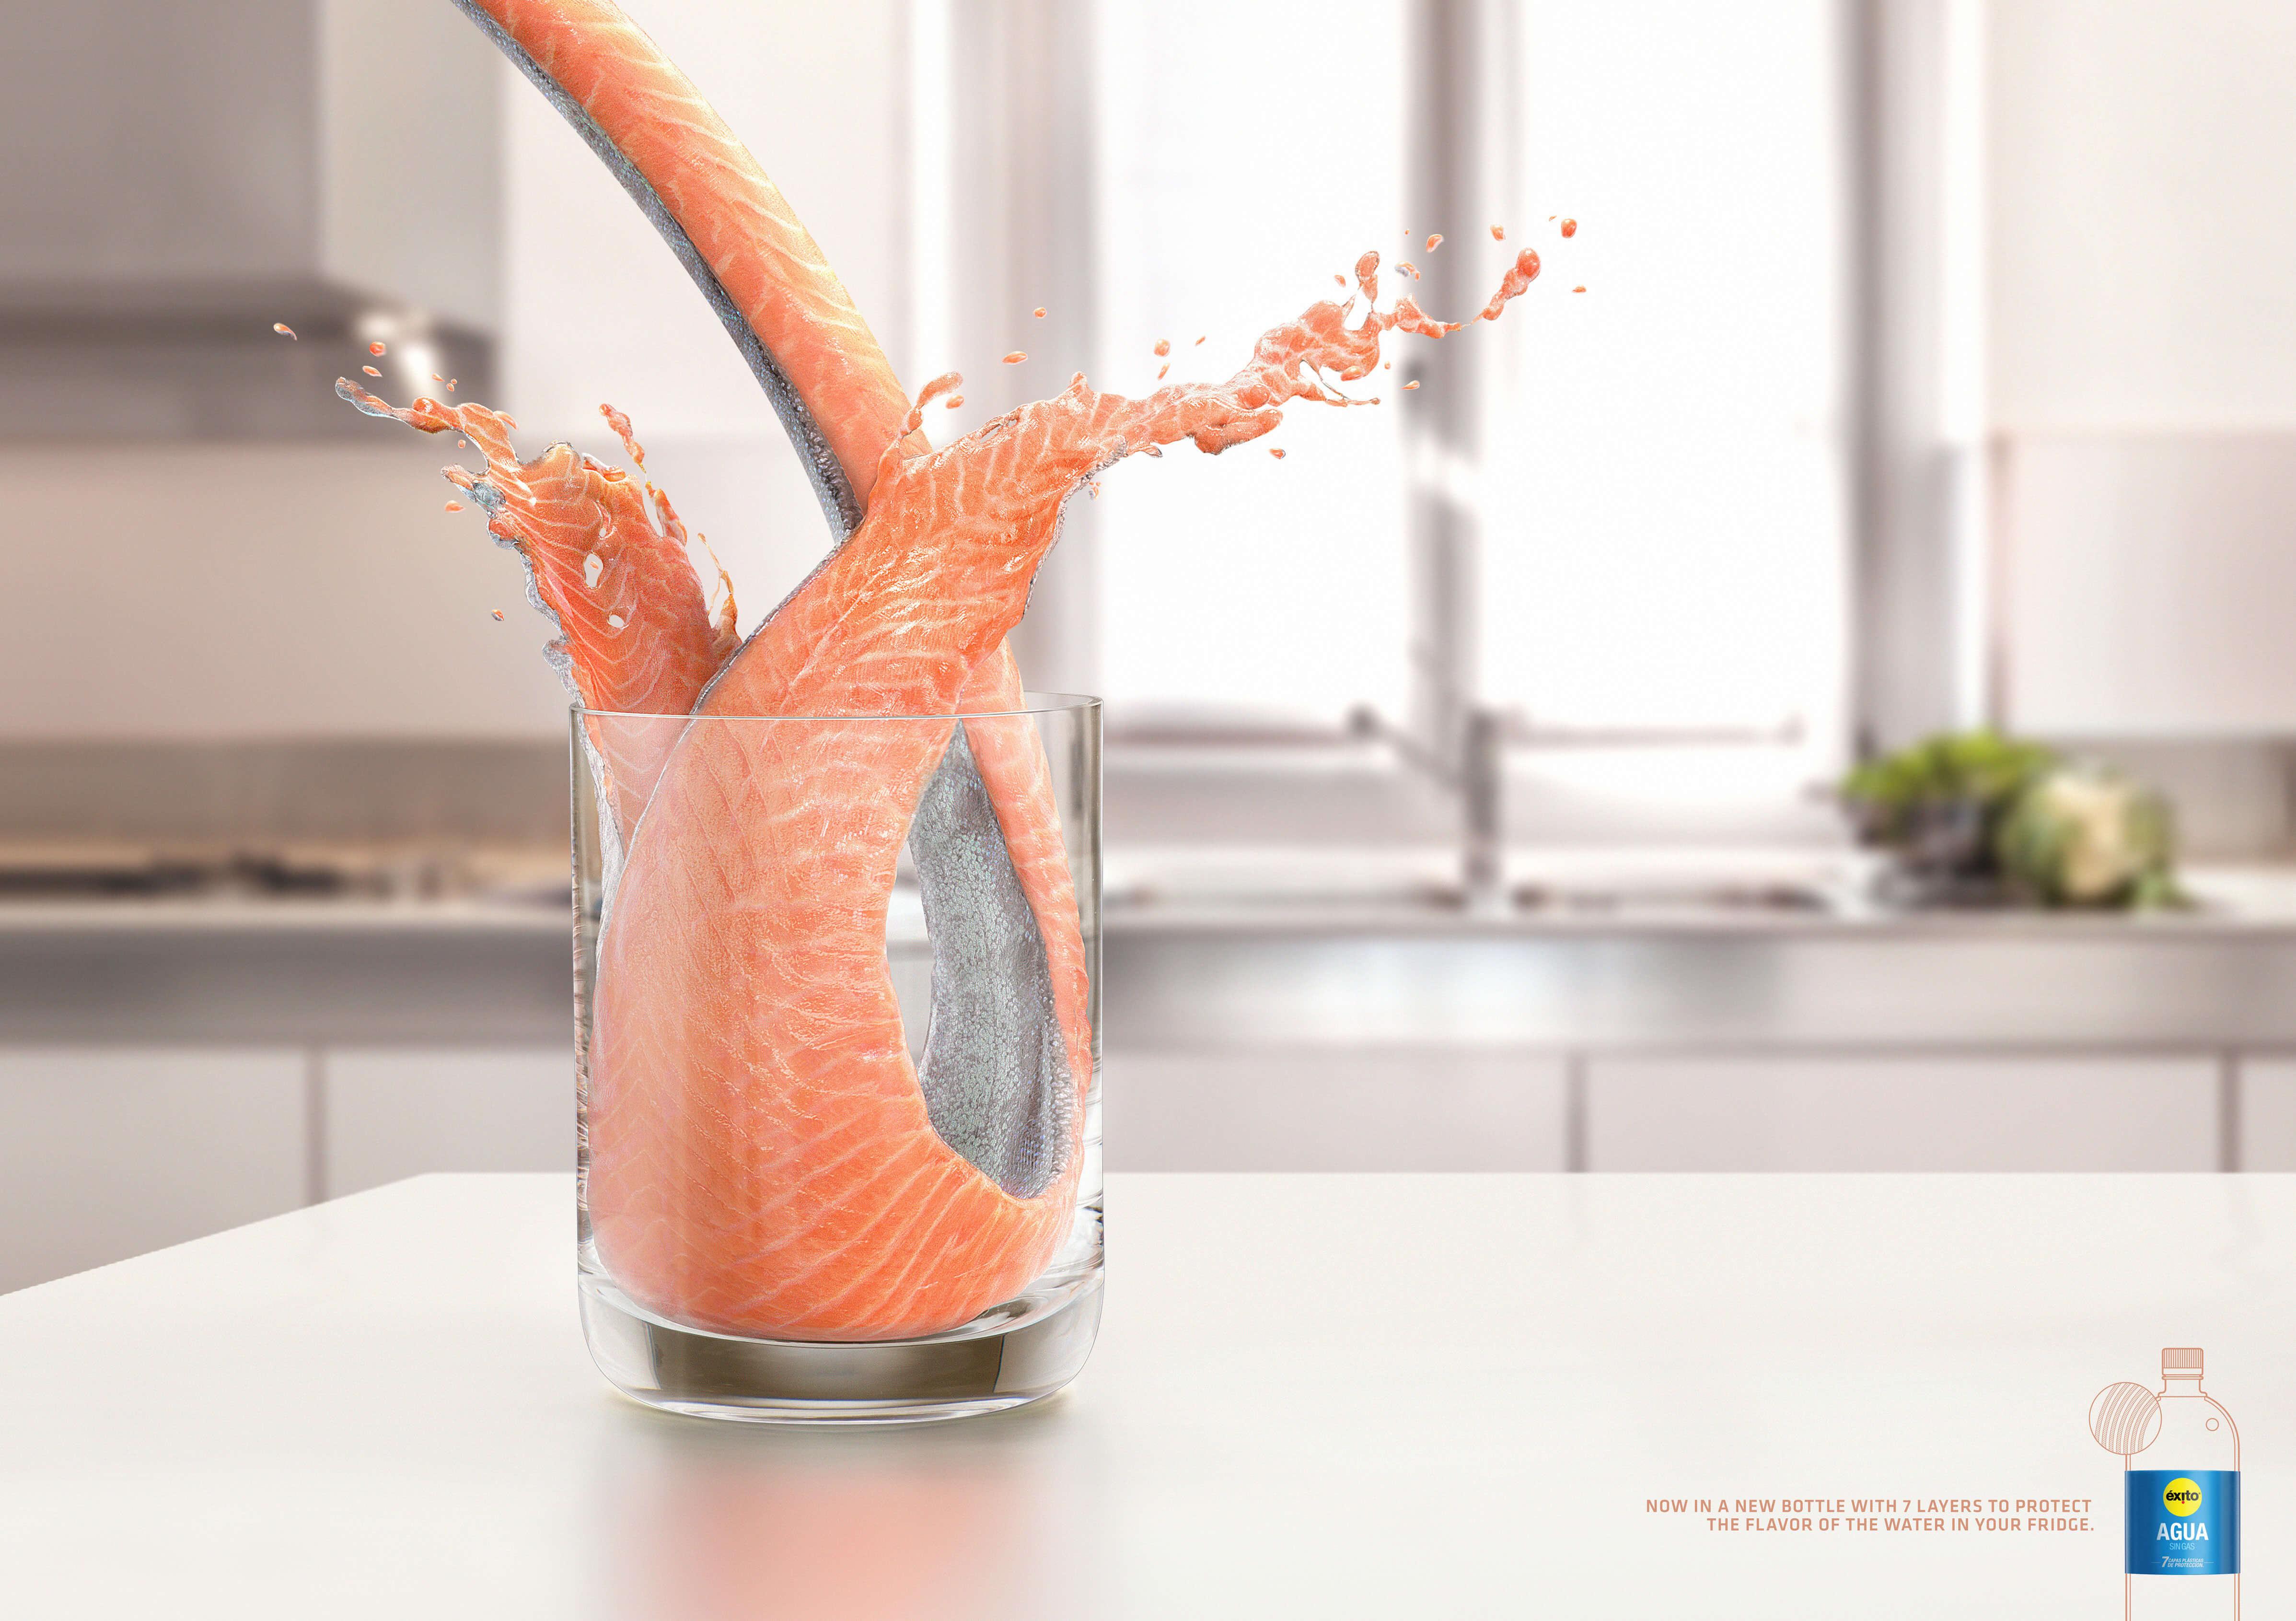 Шедевры рекламы - Exito